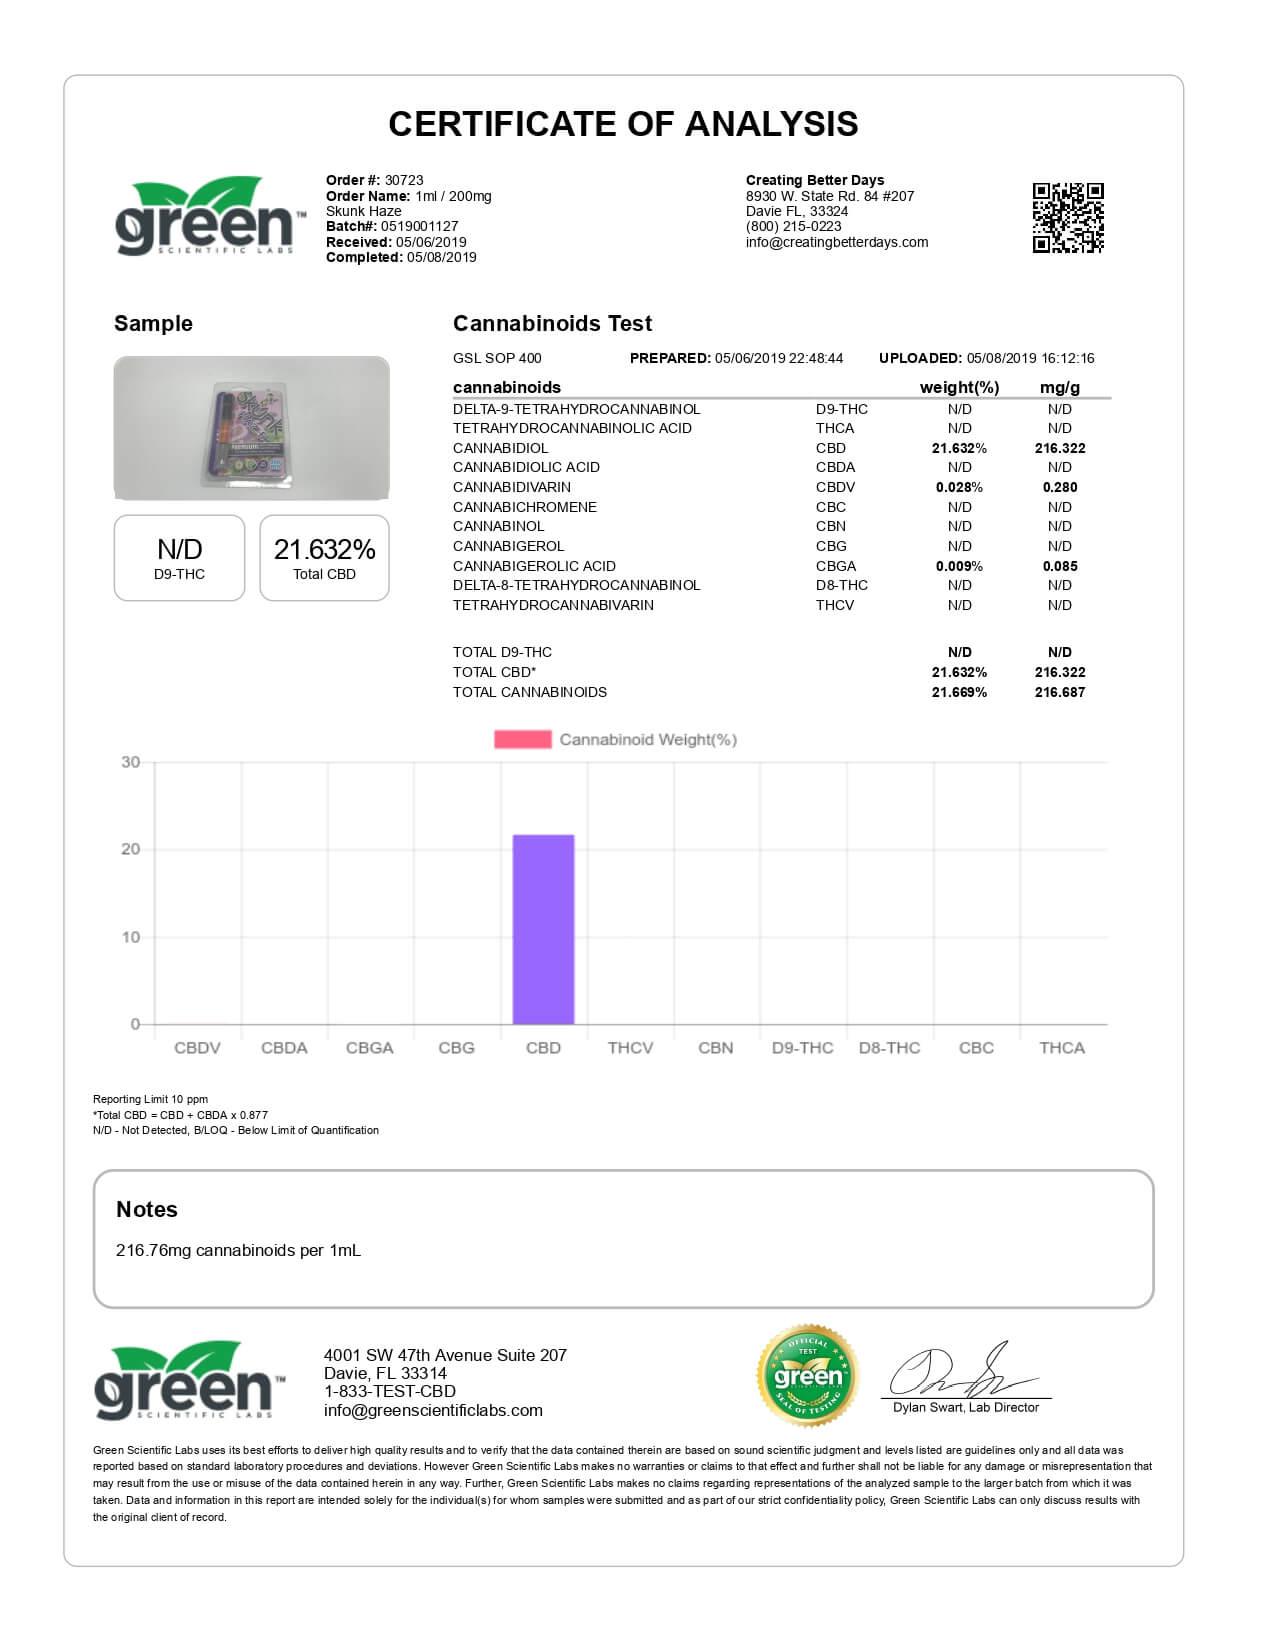 Creating Better Days CBD Cartridge Skunk Haze 200mg Lab Report